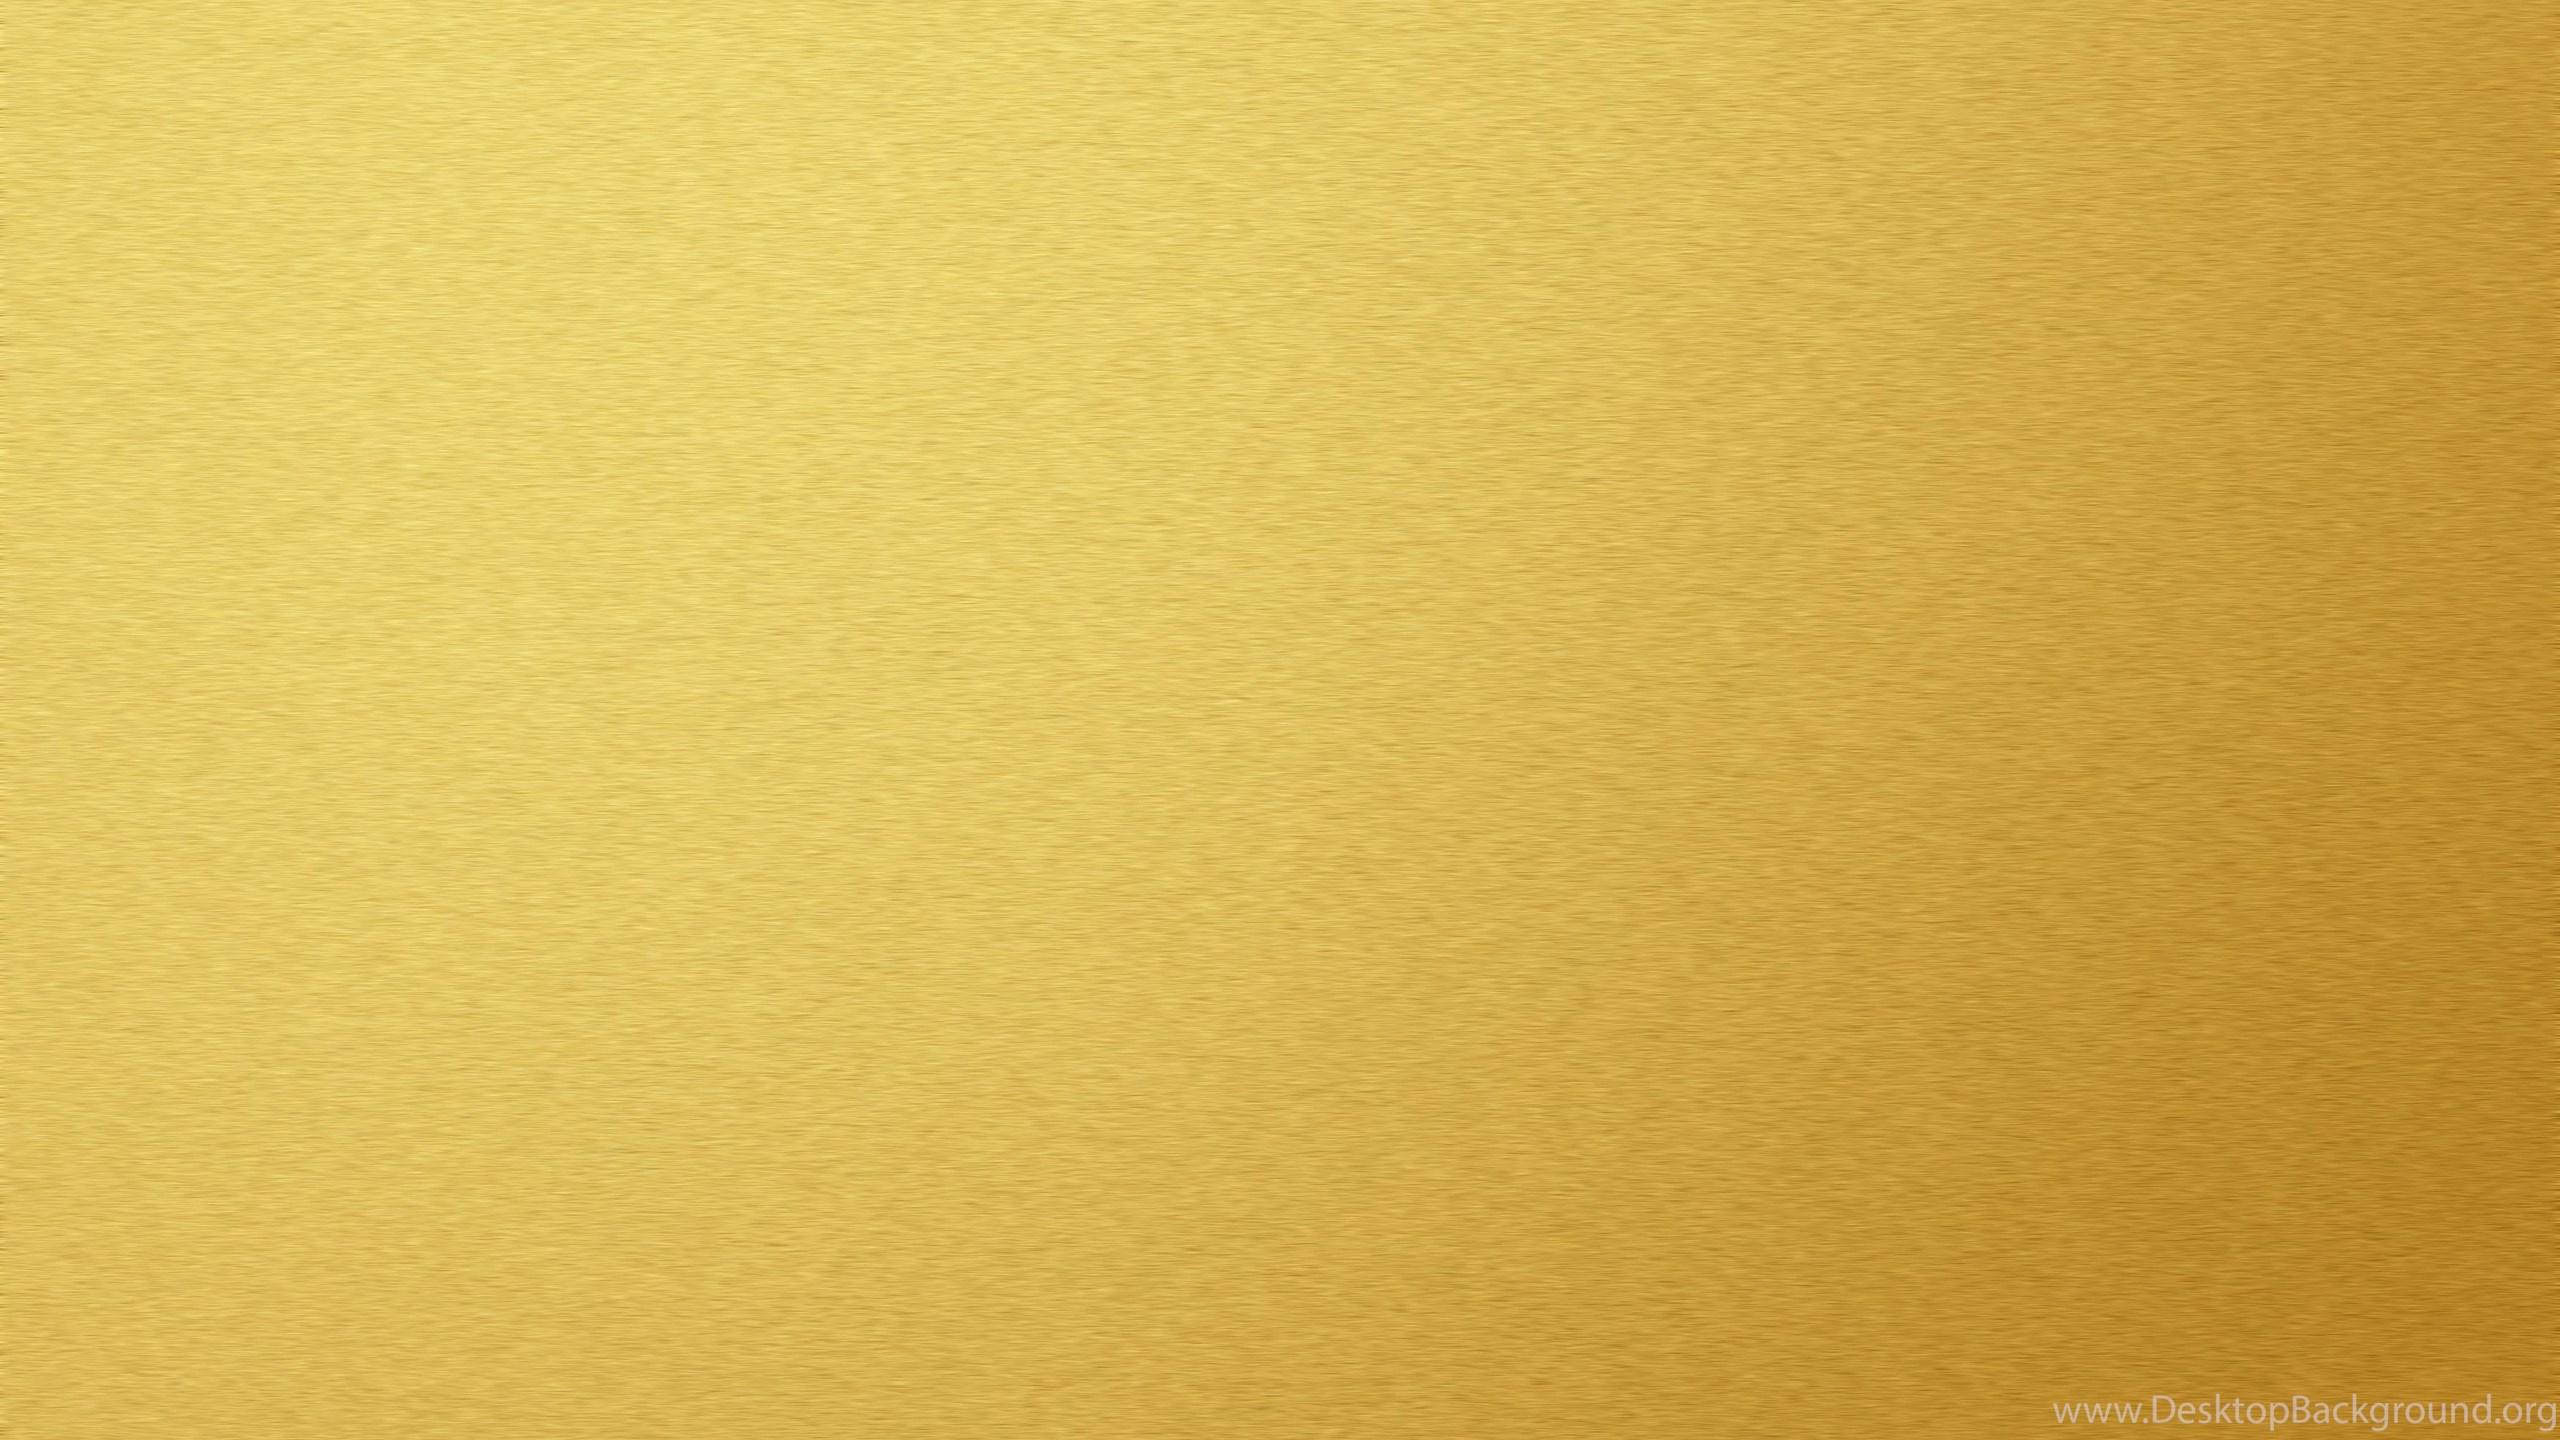 gold color backgrounds wallpapers cave desktop background